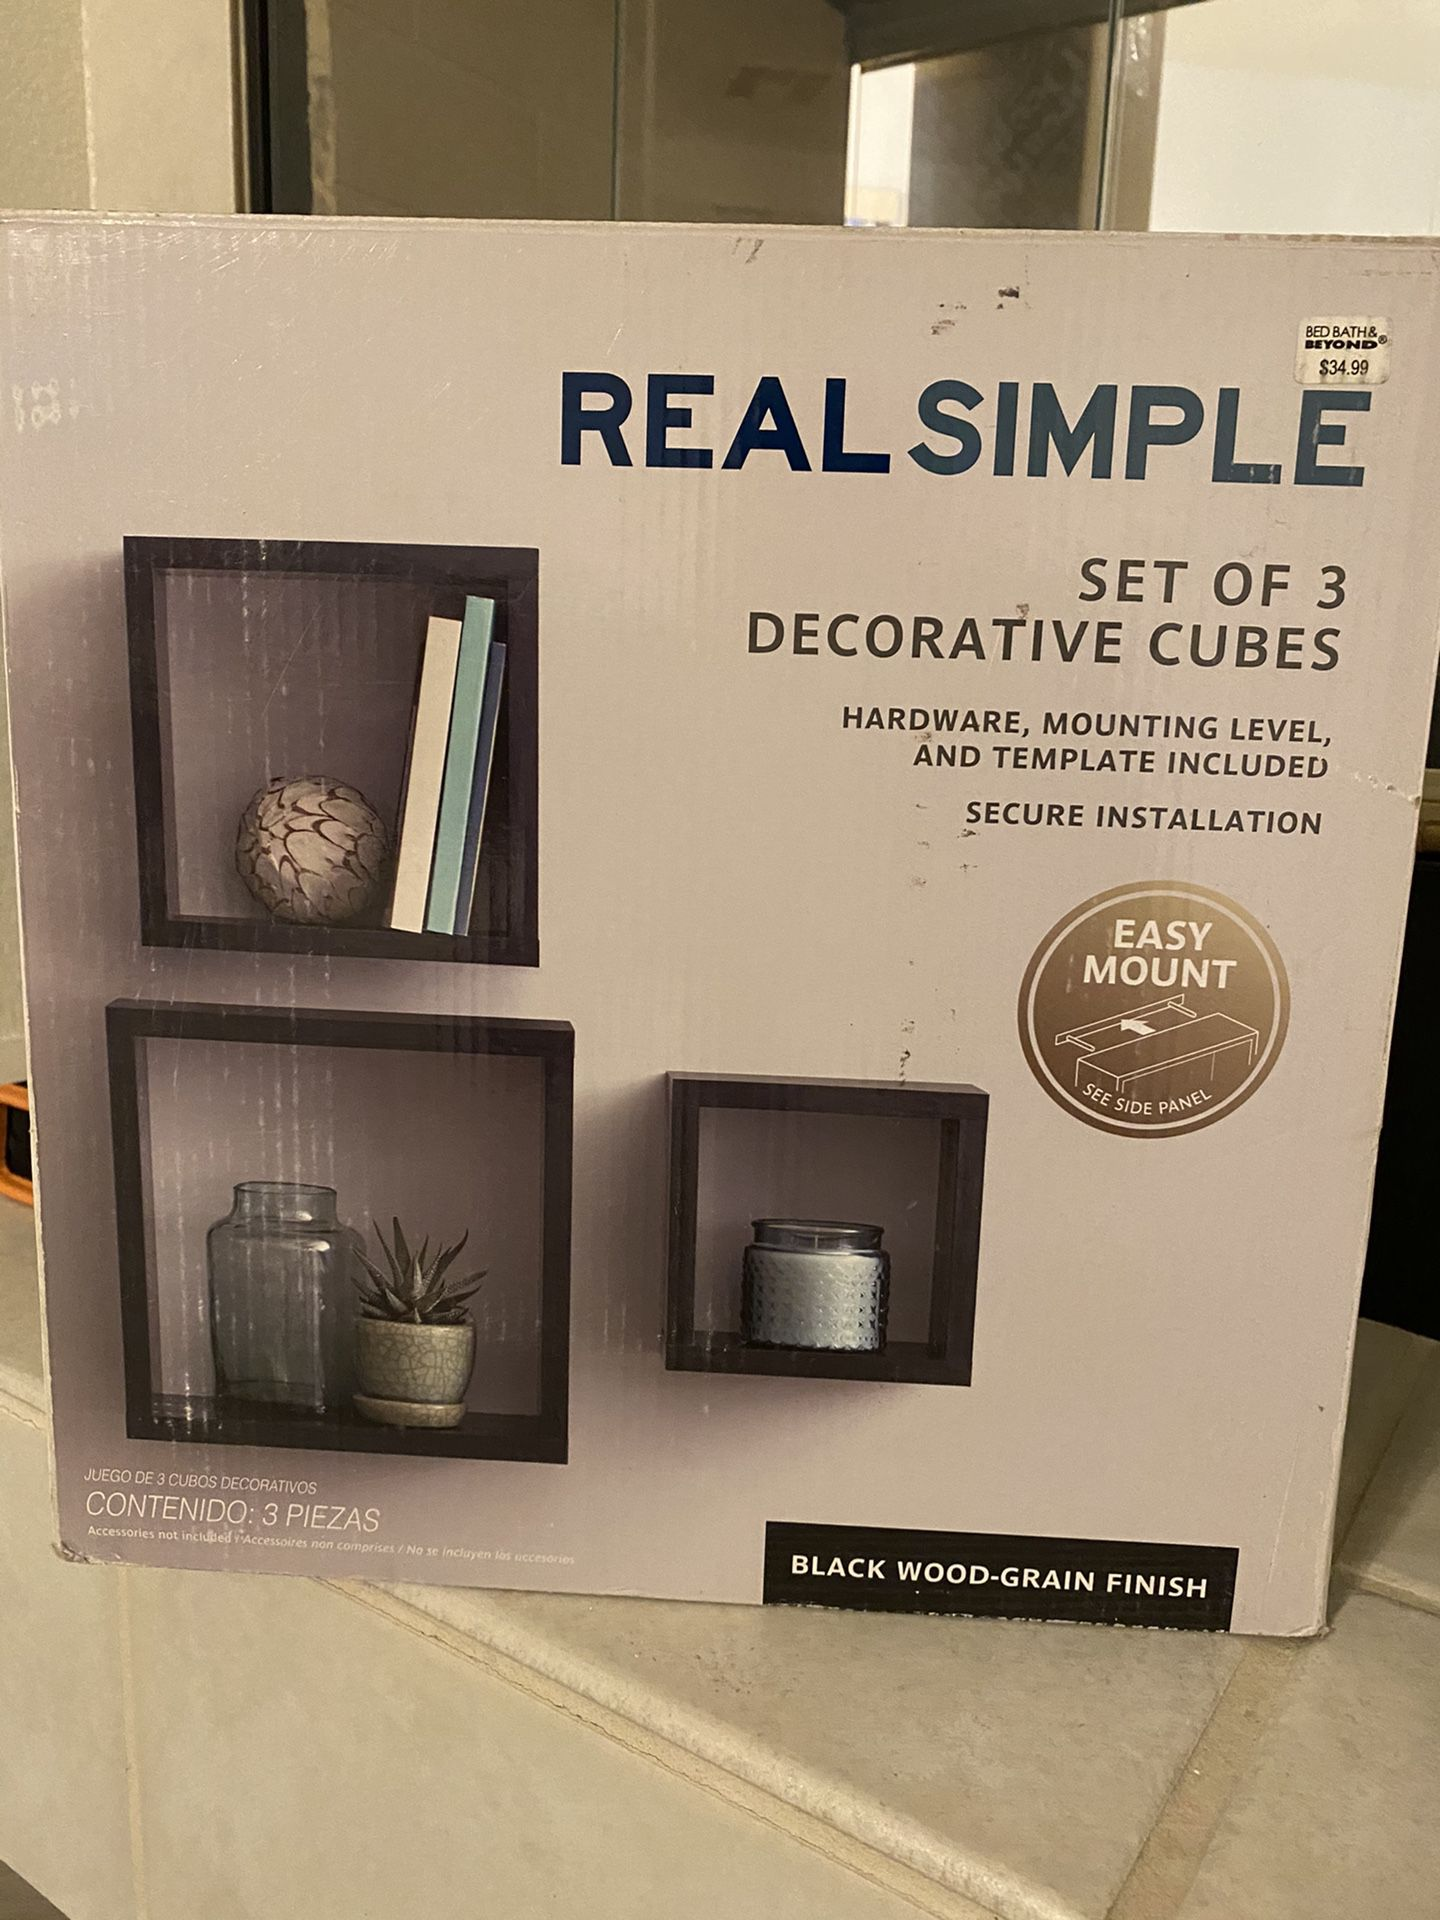 Wall Shelves - Set of 3 decorative cubes